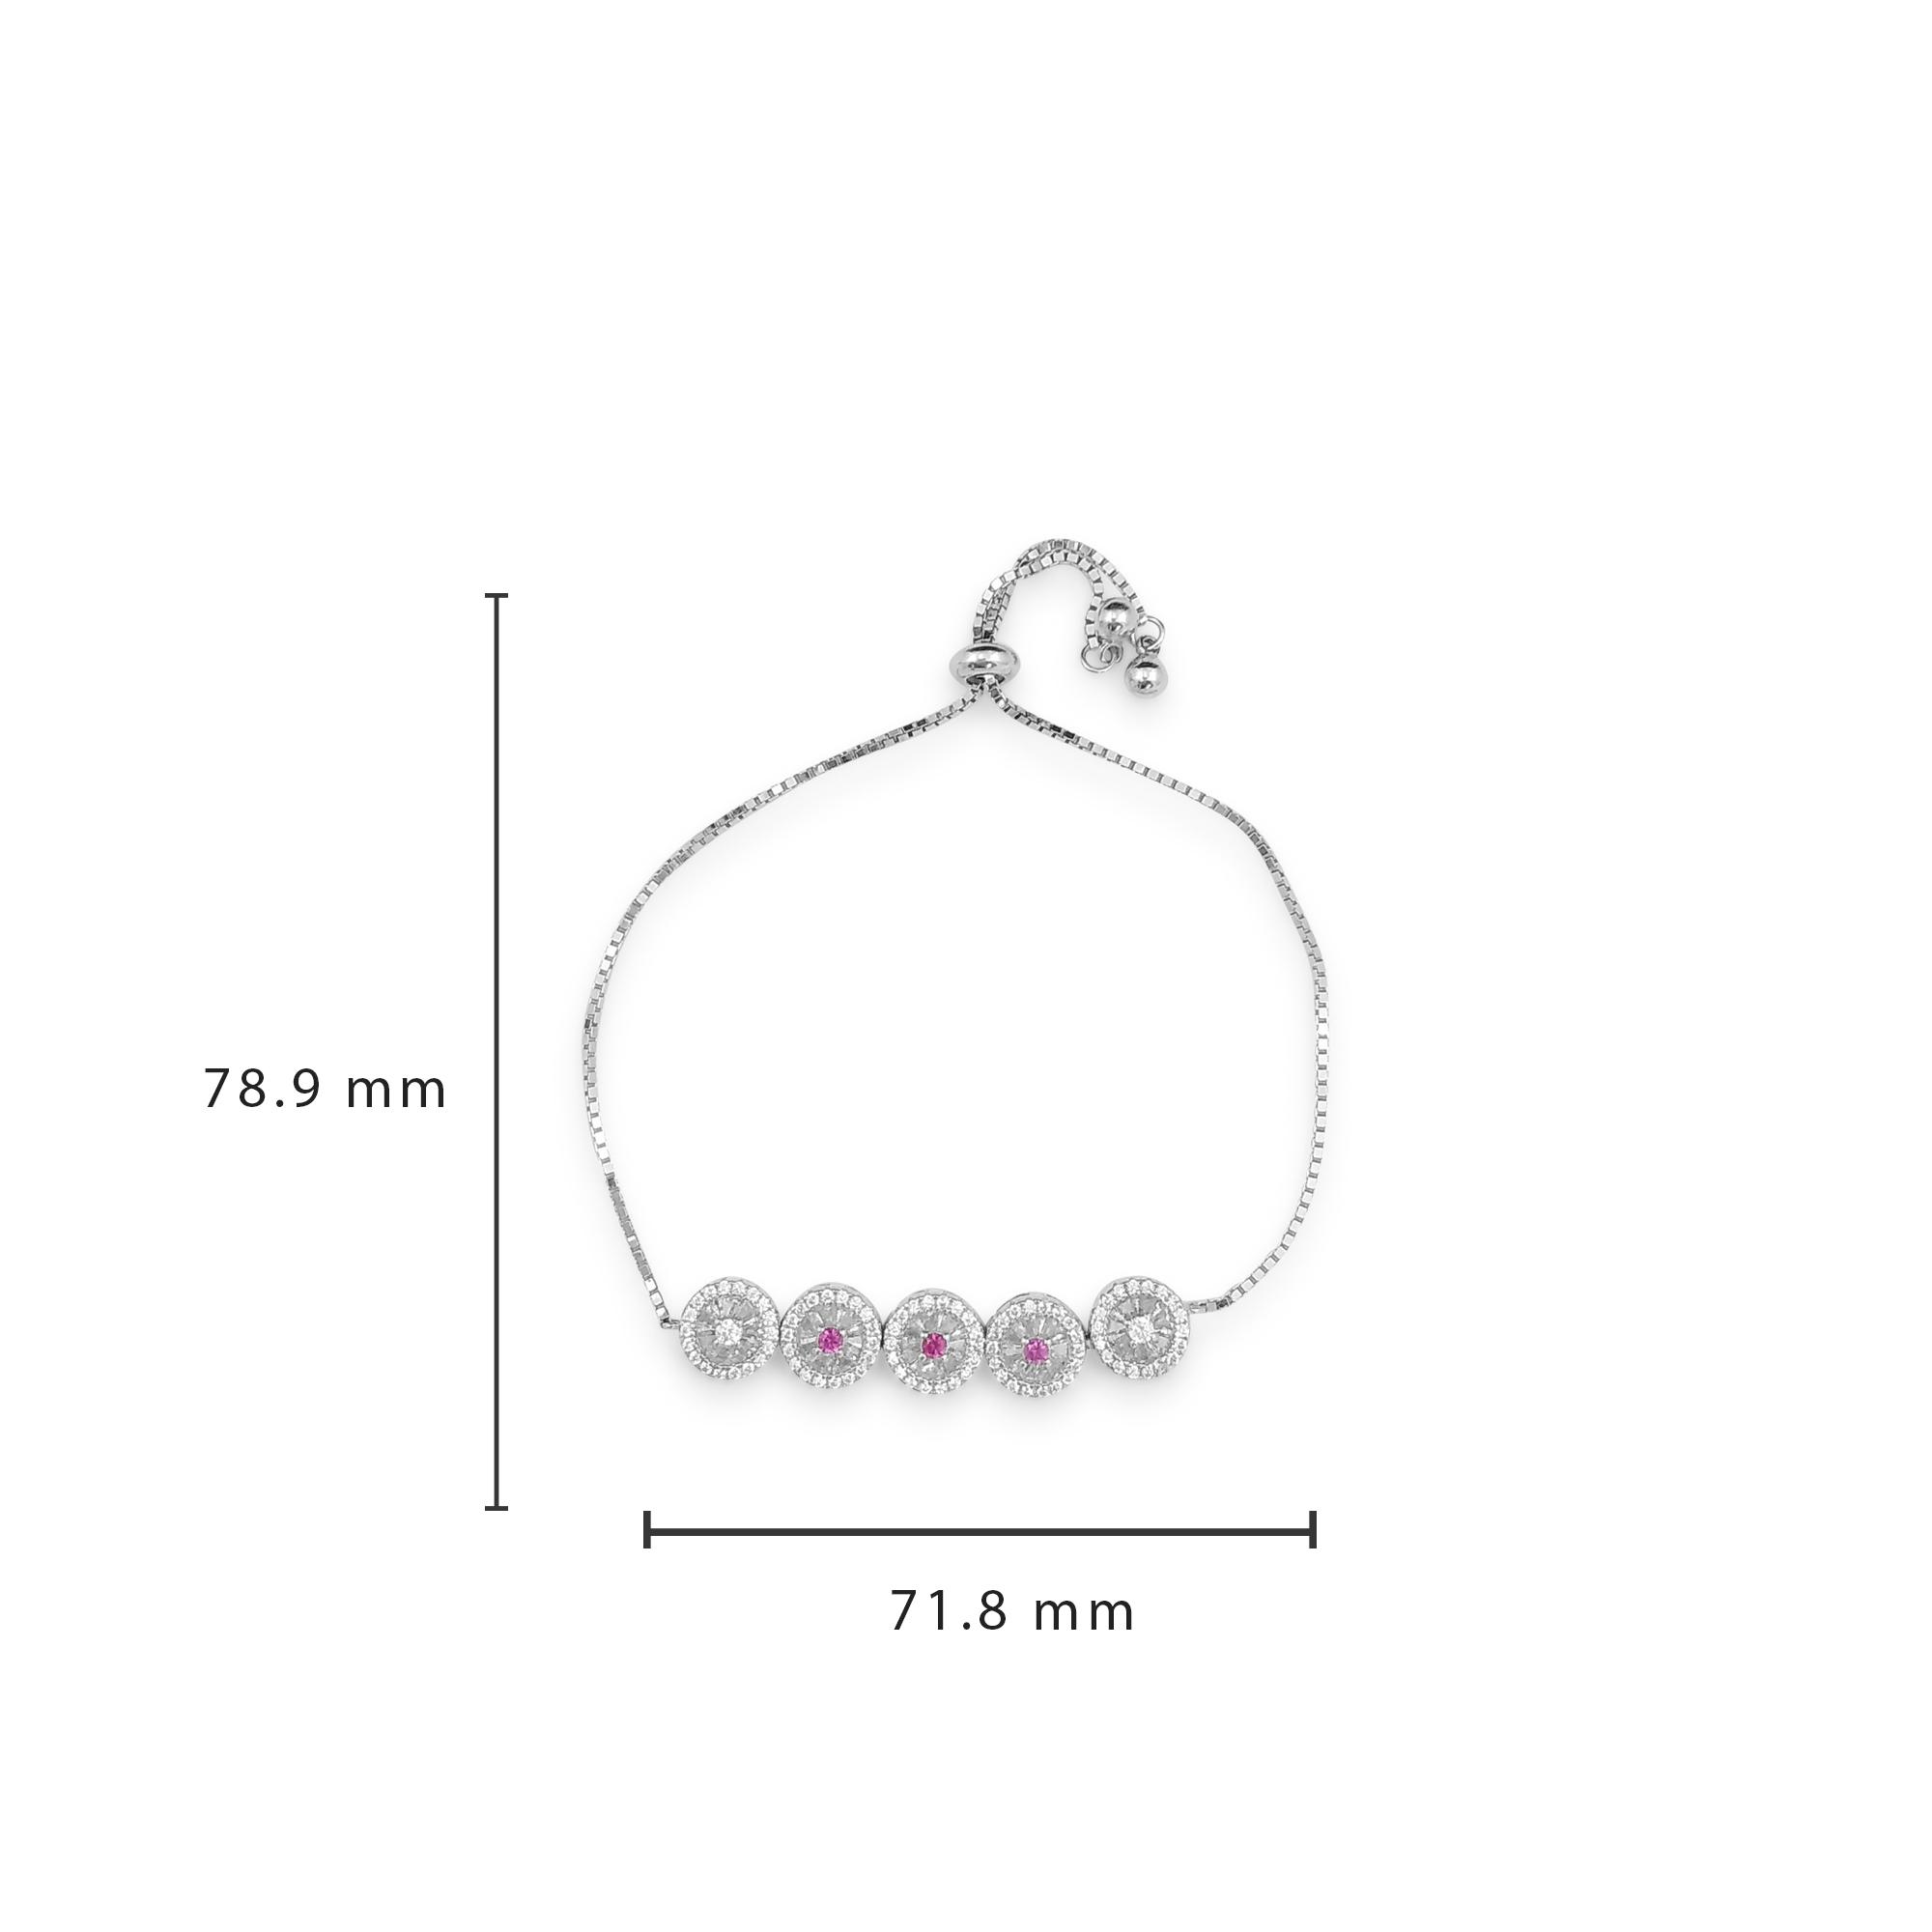 Petite Balles Bracelet Online